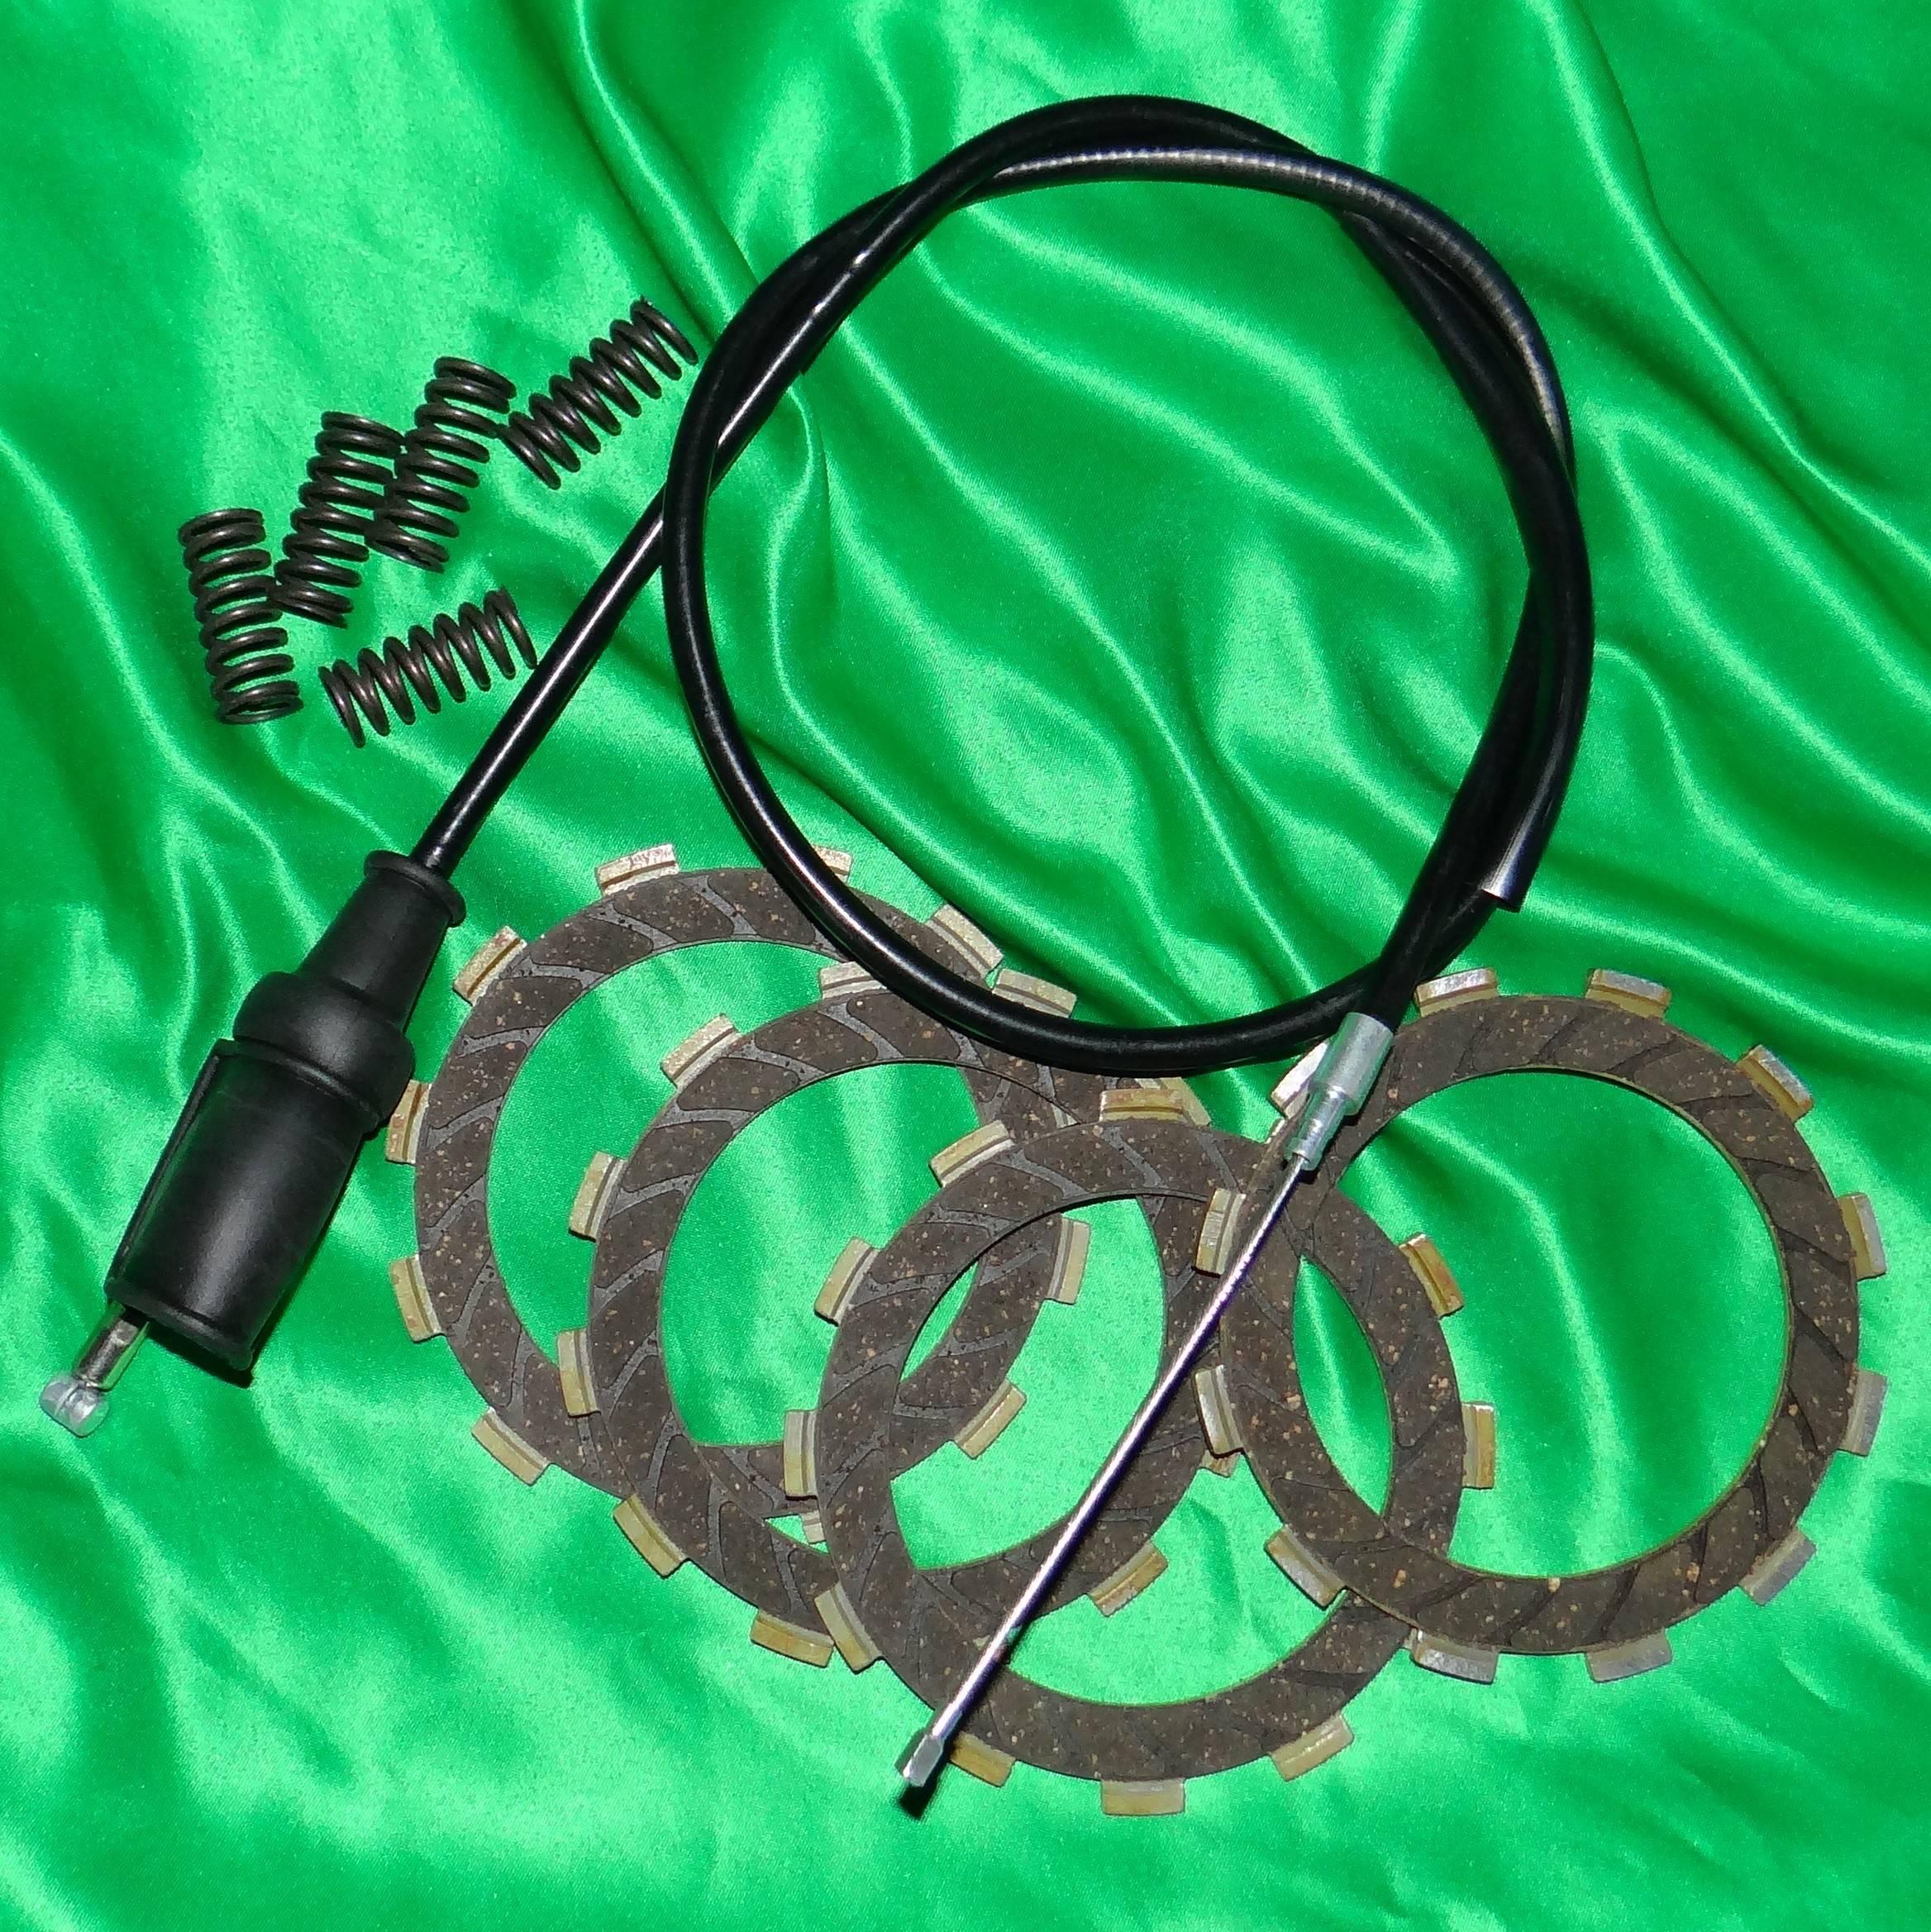 Disque d'embrayage, ressort, cable d'embrayage,... pour SHERCO 4 temps